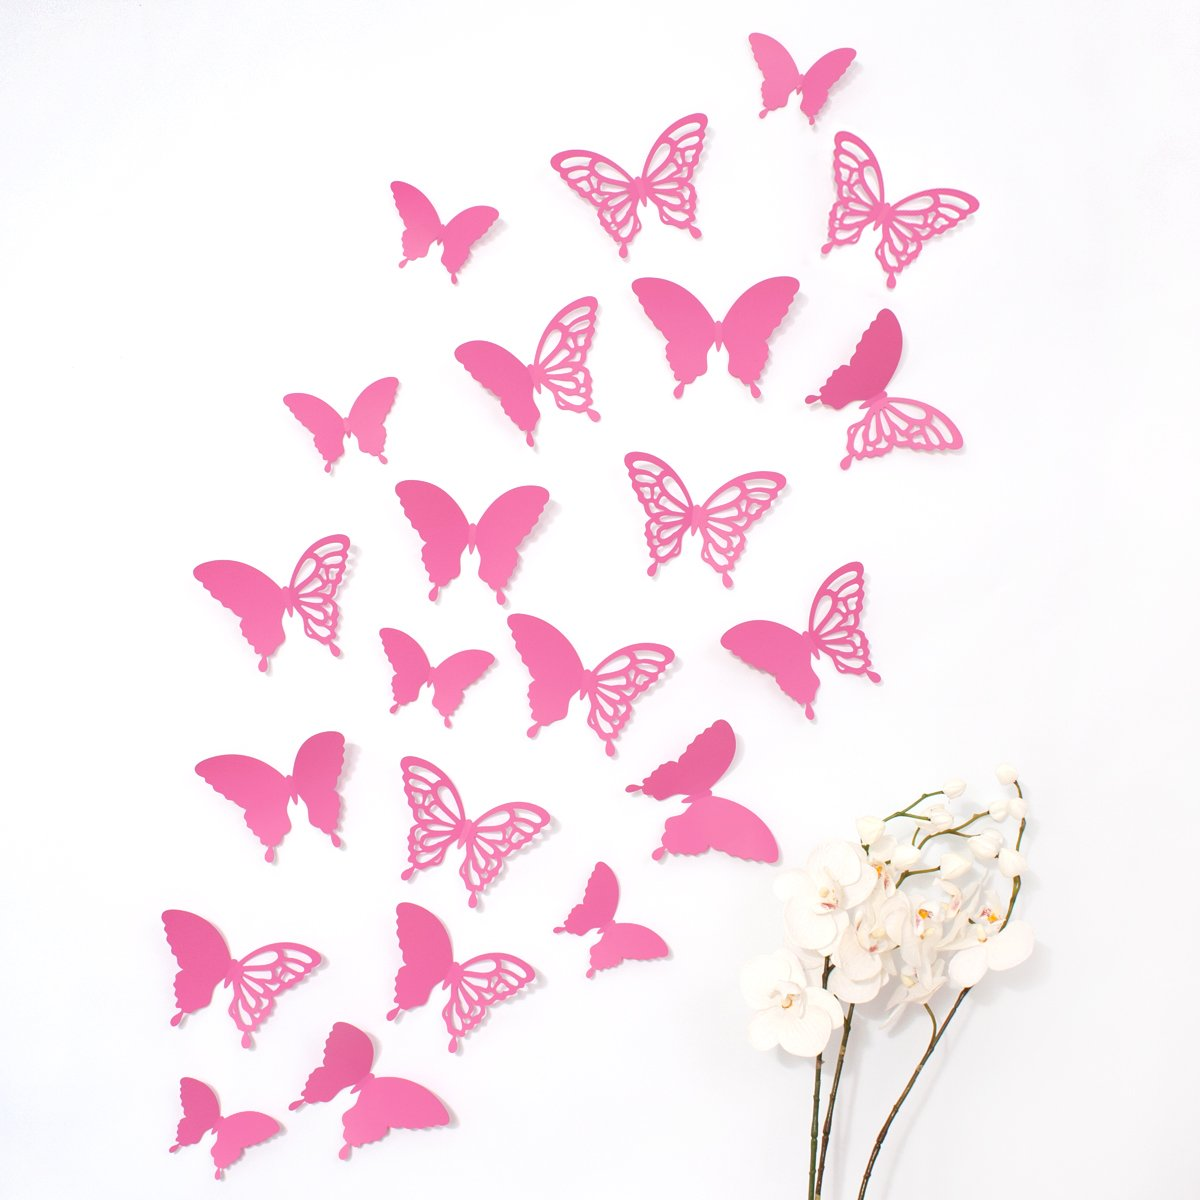 Mariposas 3D Wandkings de color FUCHSIA con detalles, conjunto de ...